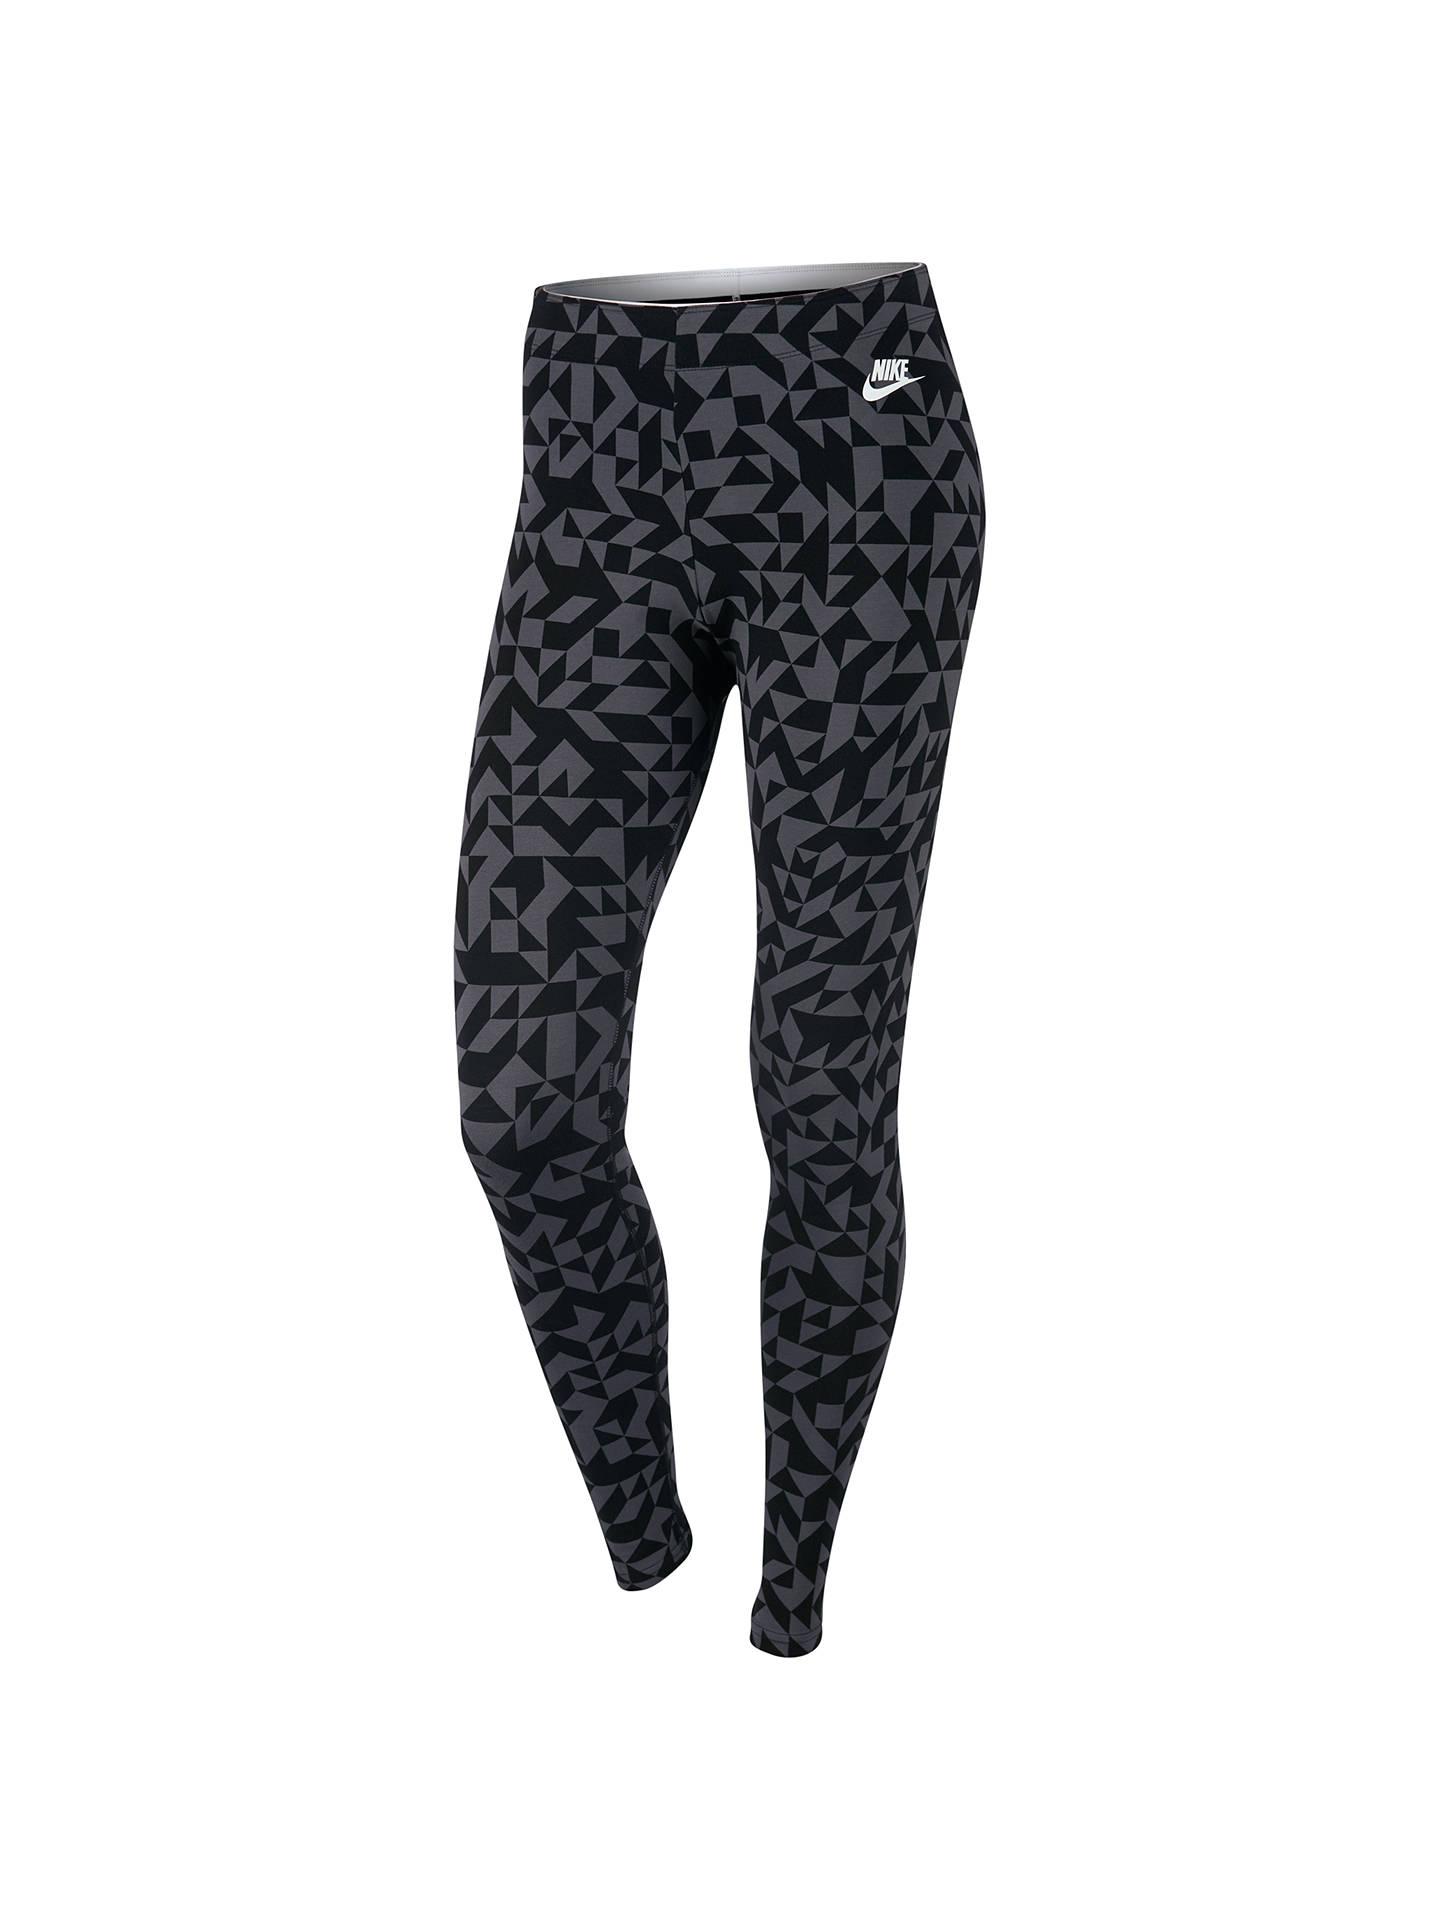 627ac3db88637f Buy Nike Sportswear Club Tangrams Leggings, Black/Grey, XS Online at  johnlewis.